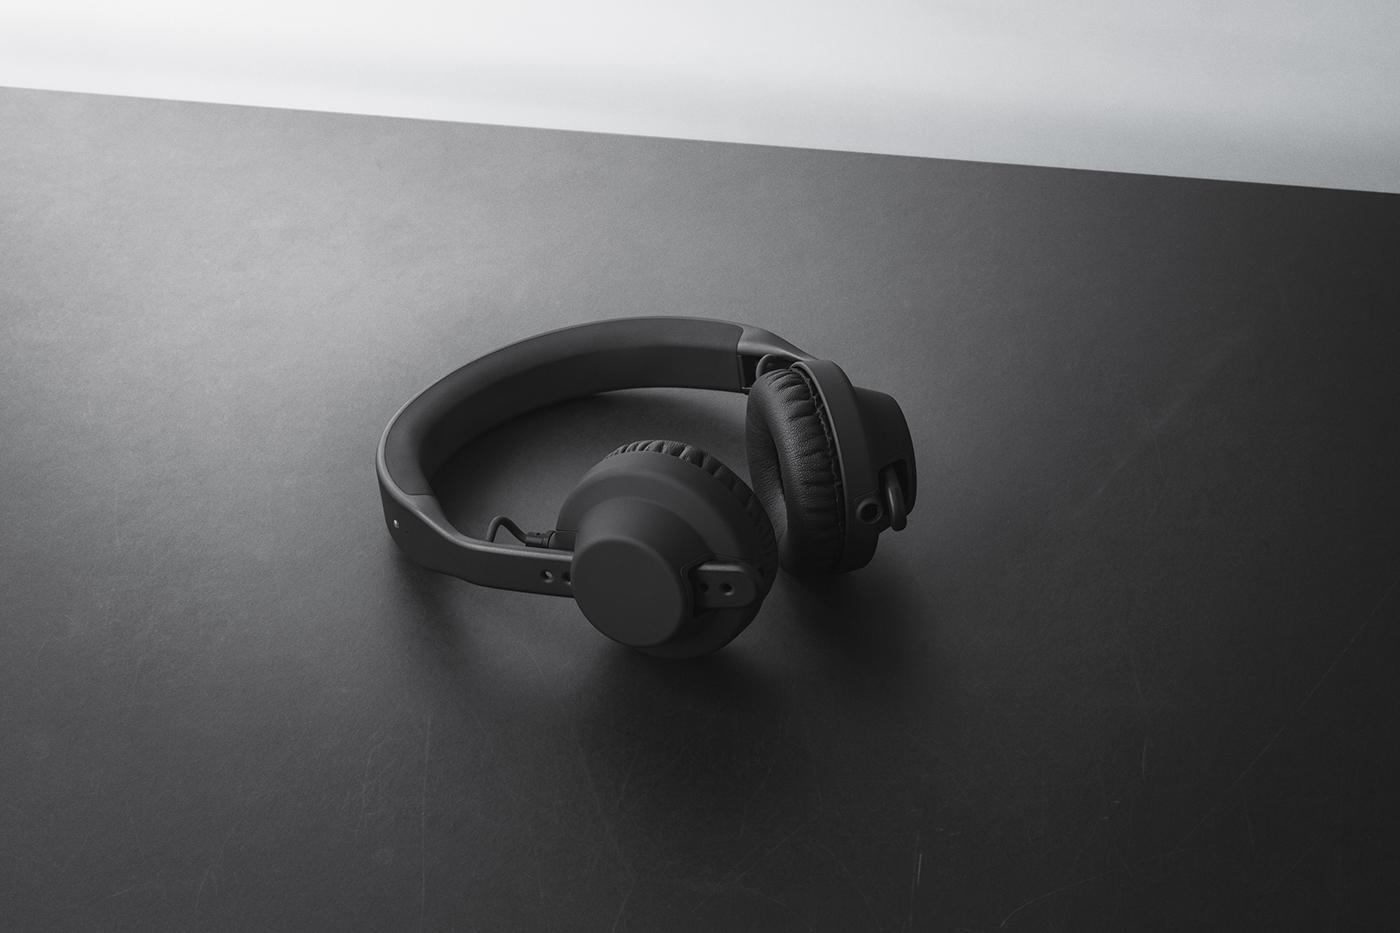 AIAIAI TMA-2 Modular Headphone Goes Wireless